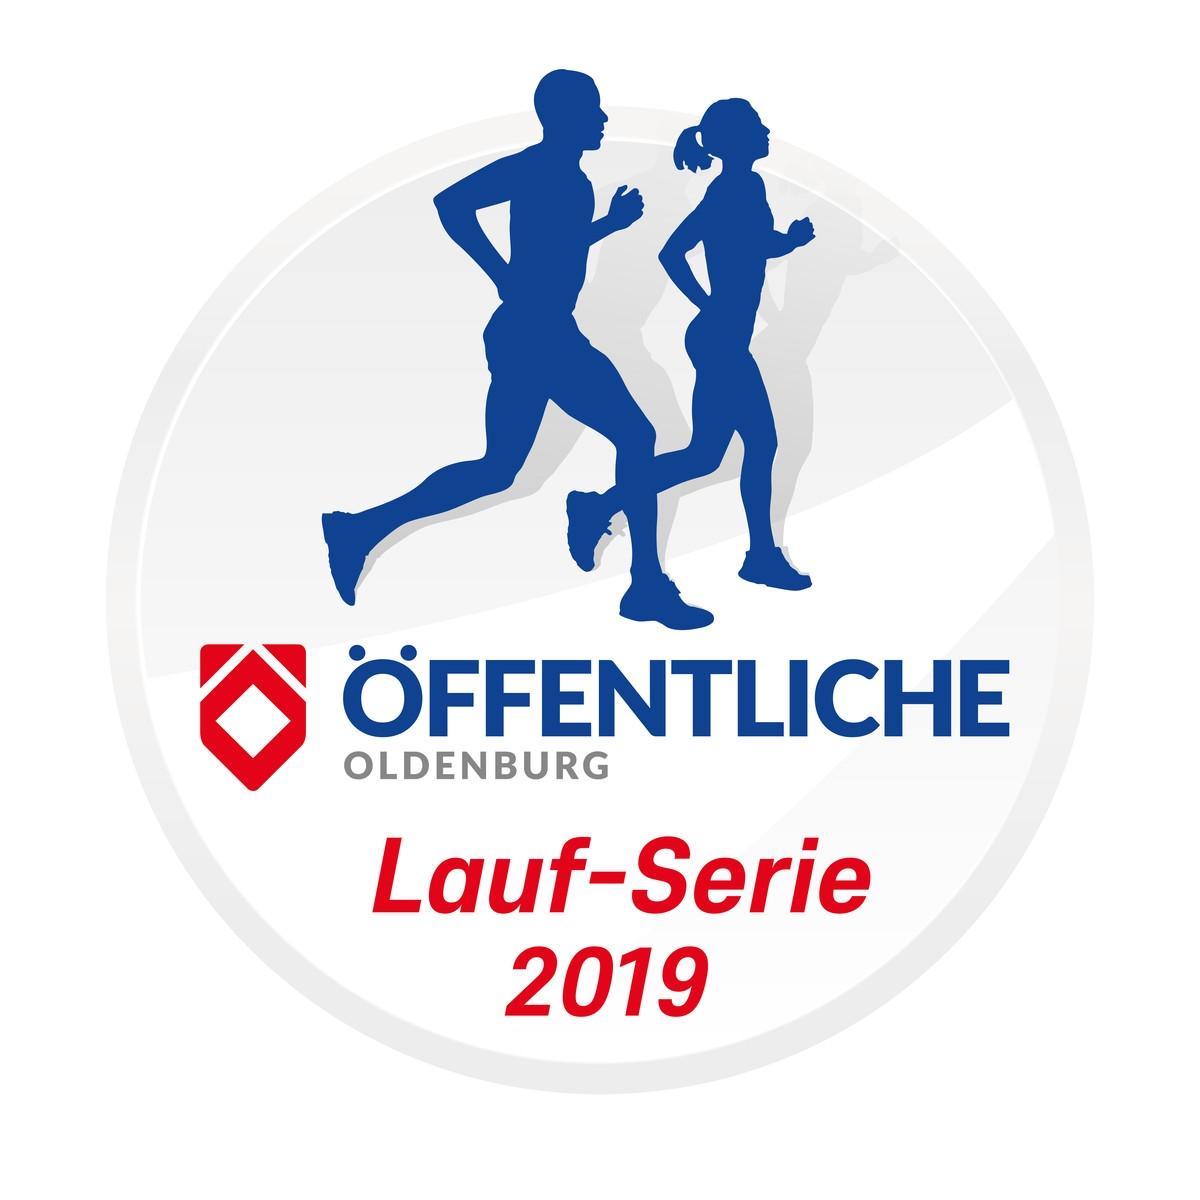 logo laufserie 2019 rgb